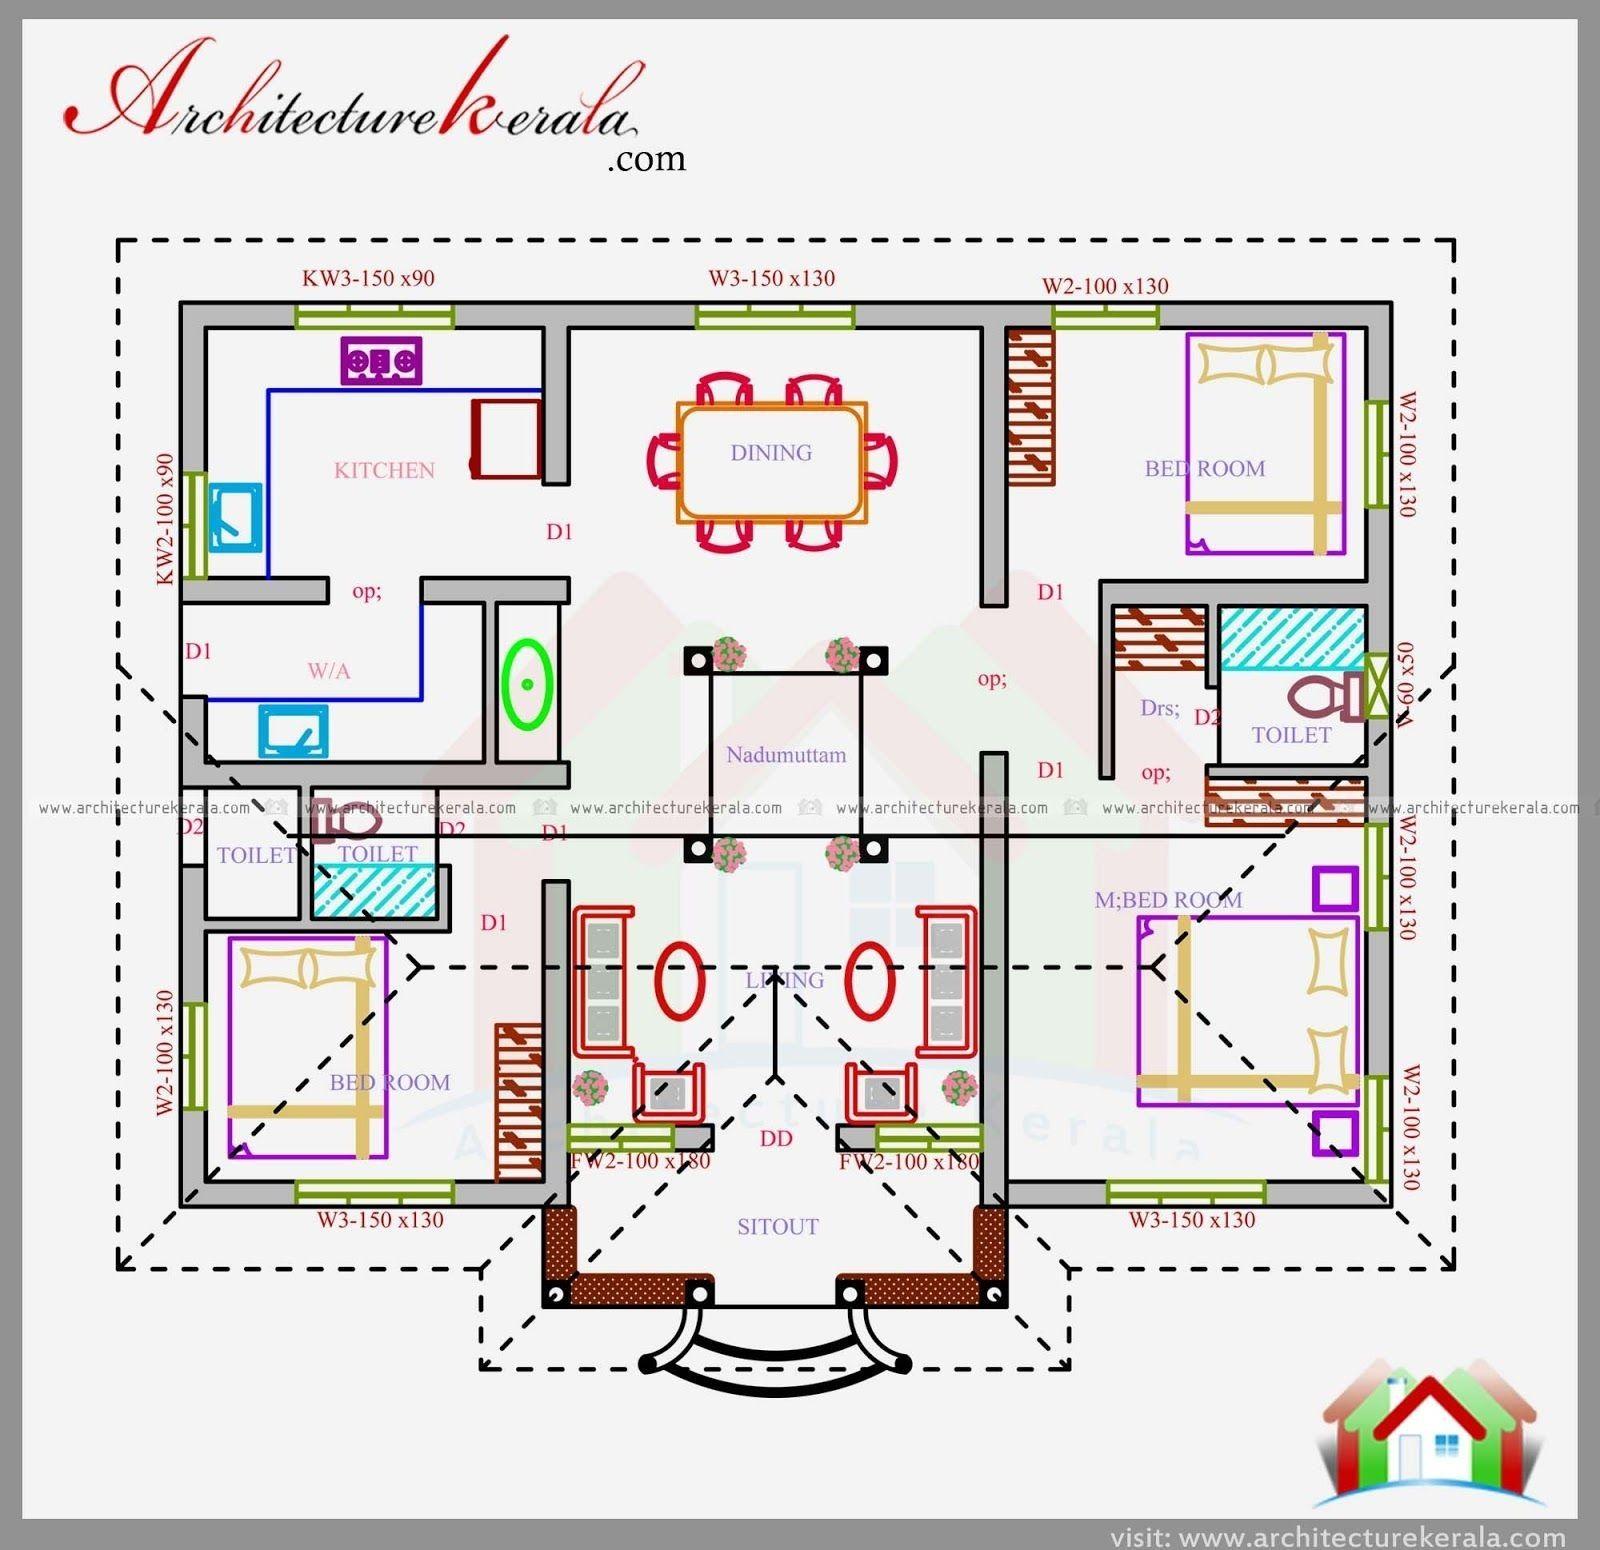 House Wiring Diagram Kerala Fresh Kerala House Plans Home Plan Kerala Low Bud Beautiful Home Plans